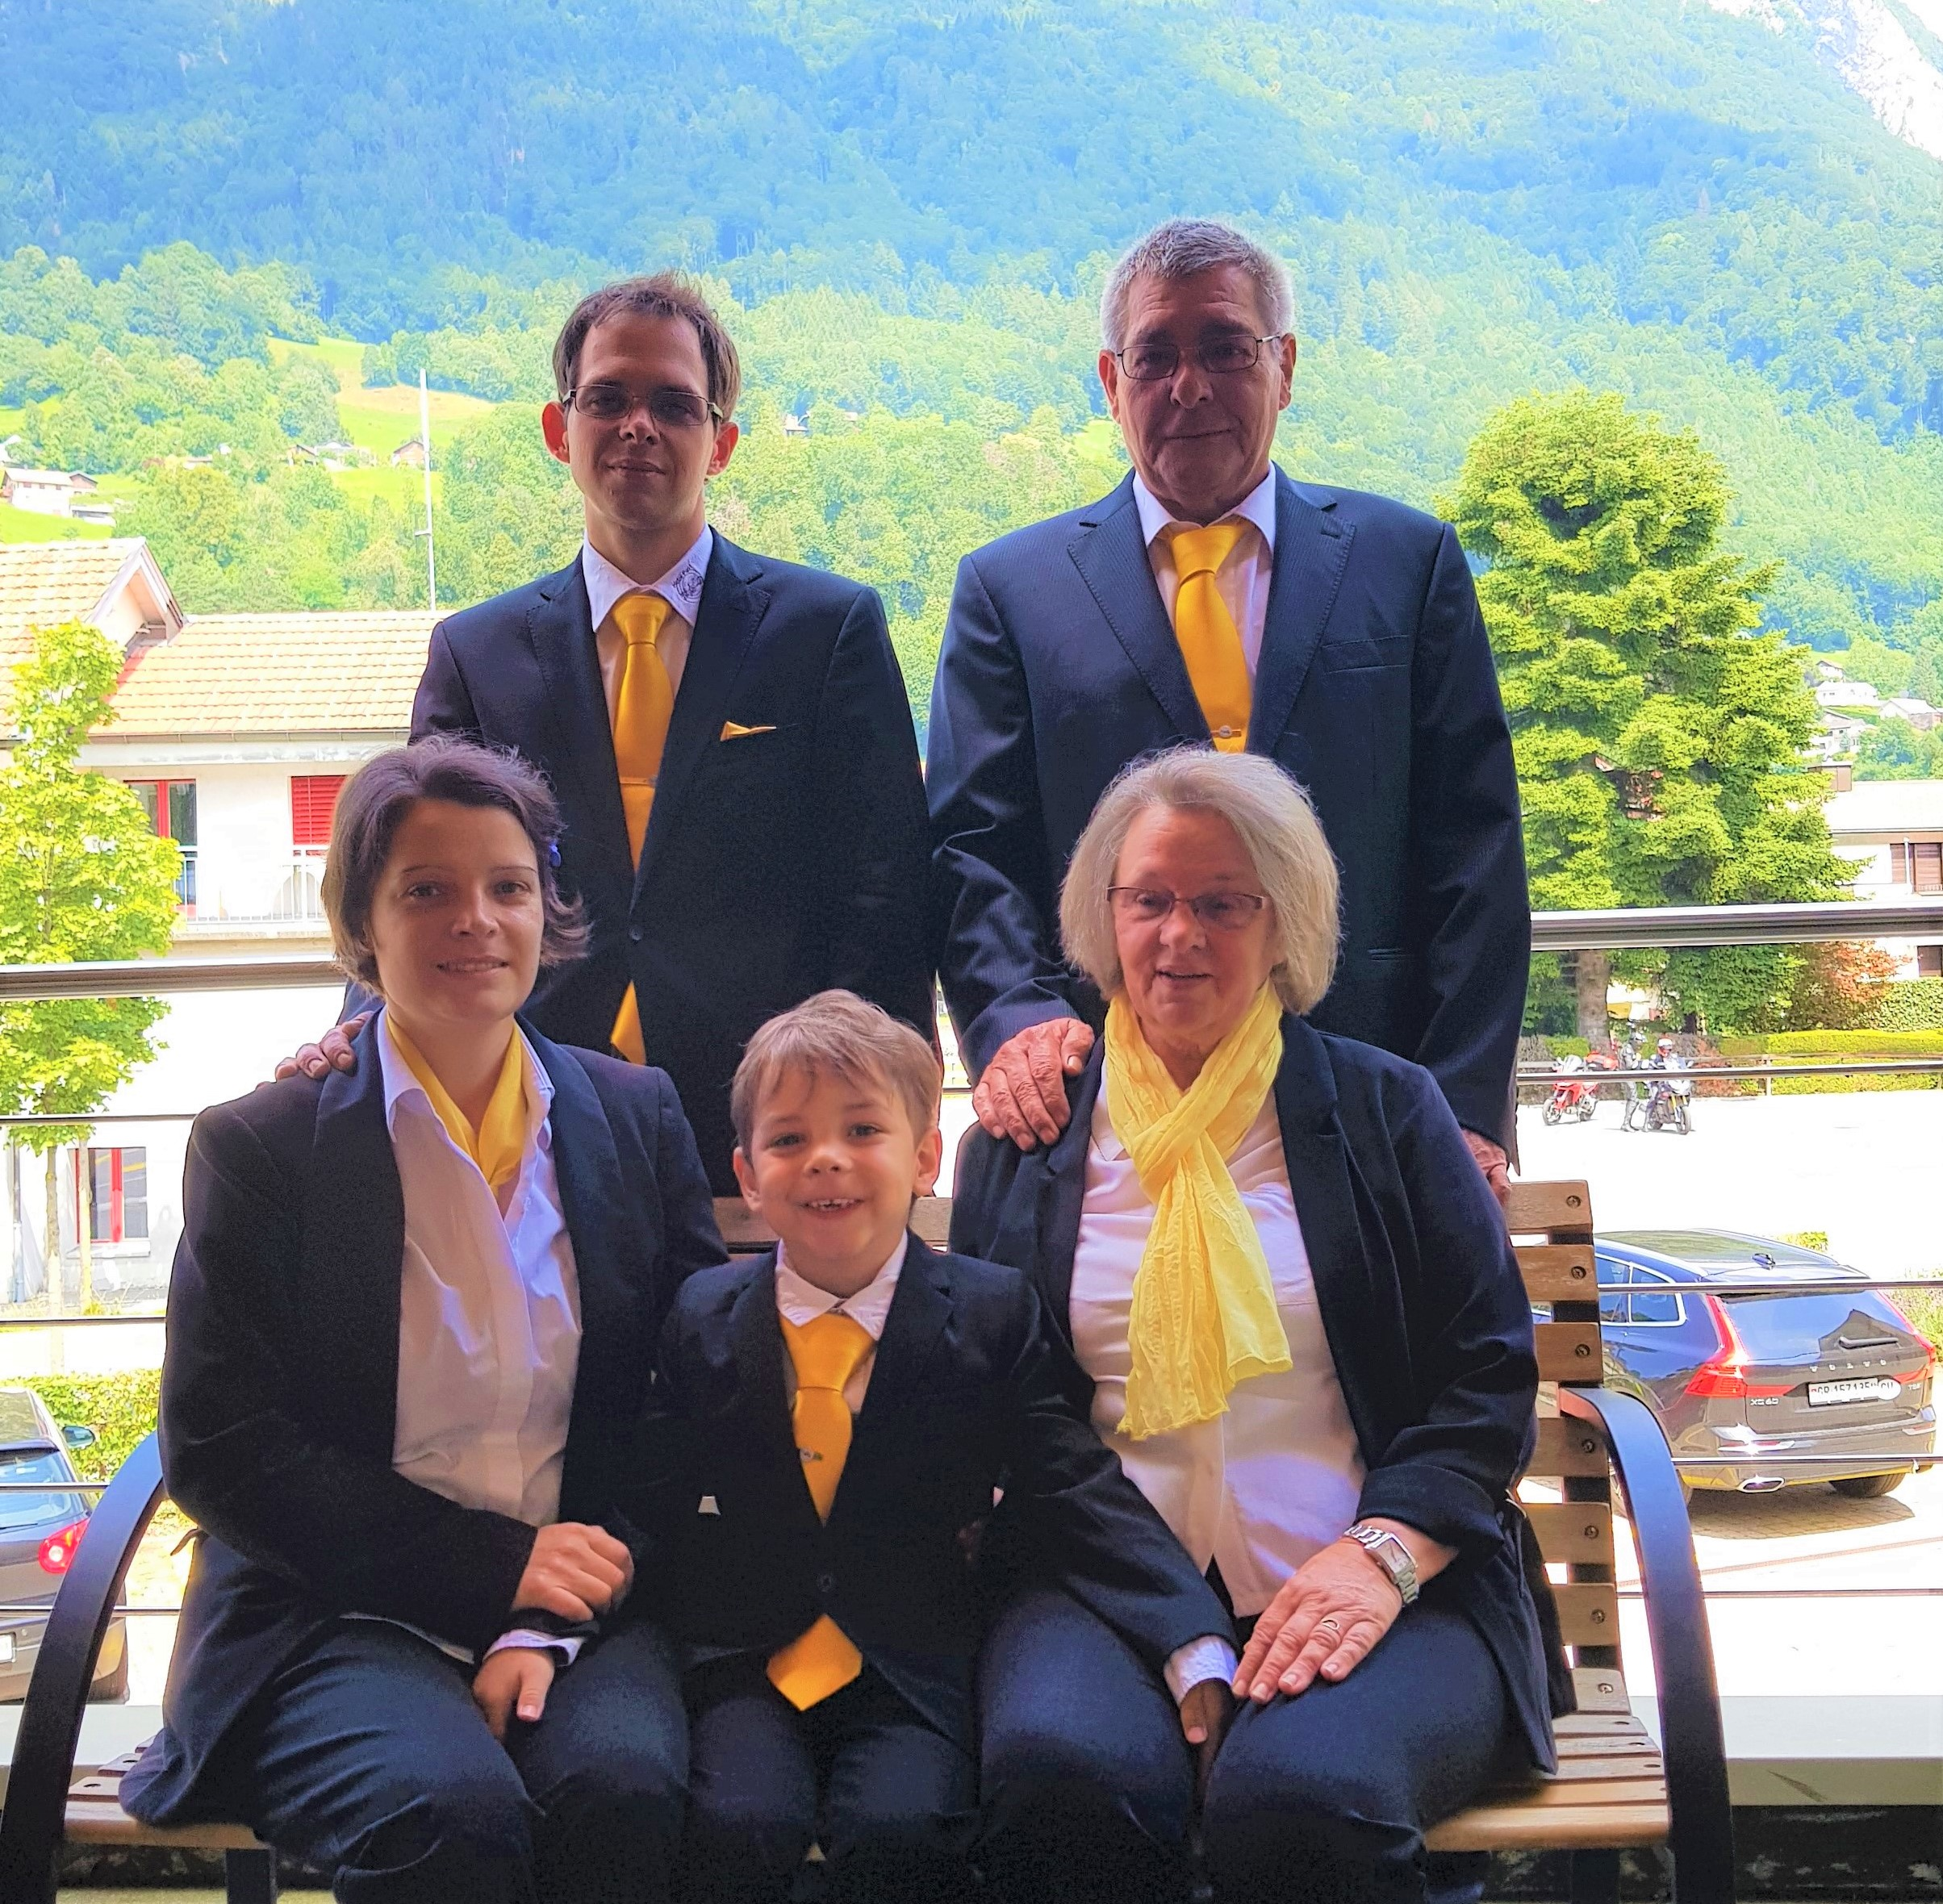 Familienfoto Hotel Post Familie Kunz-Baer